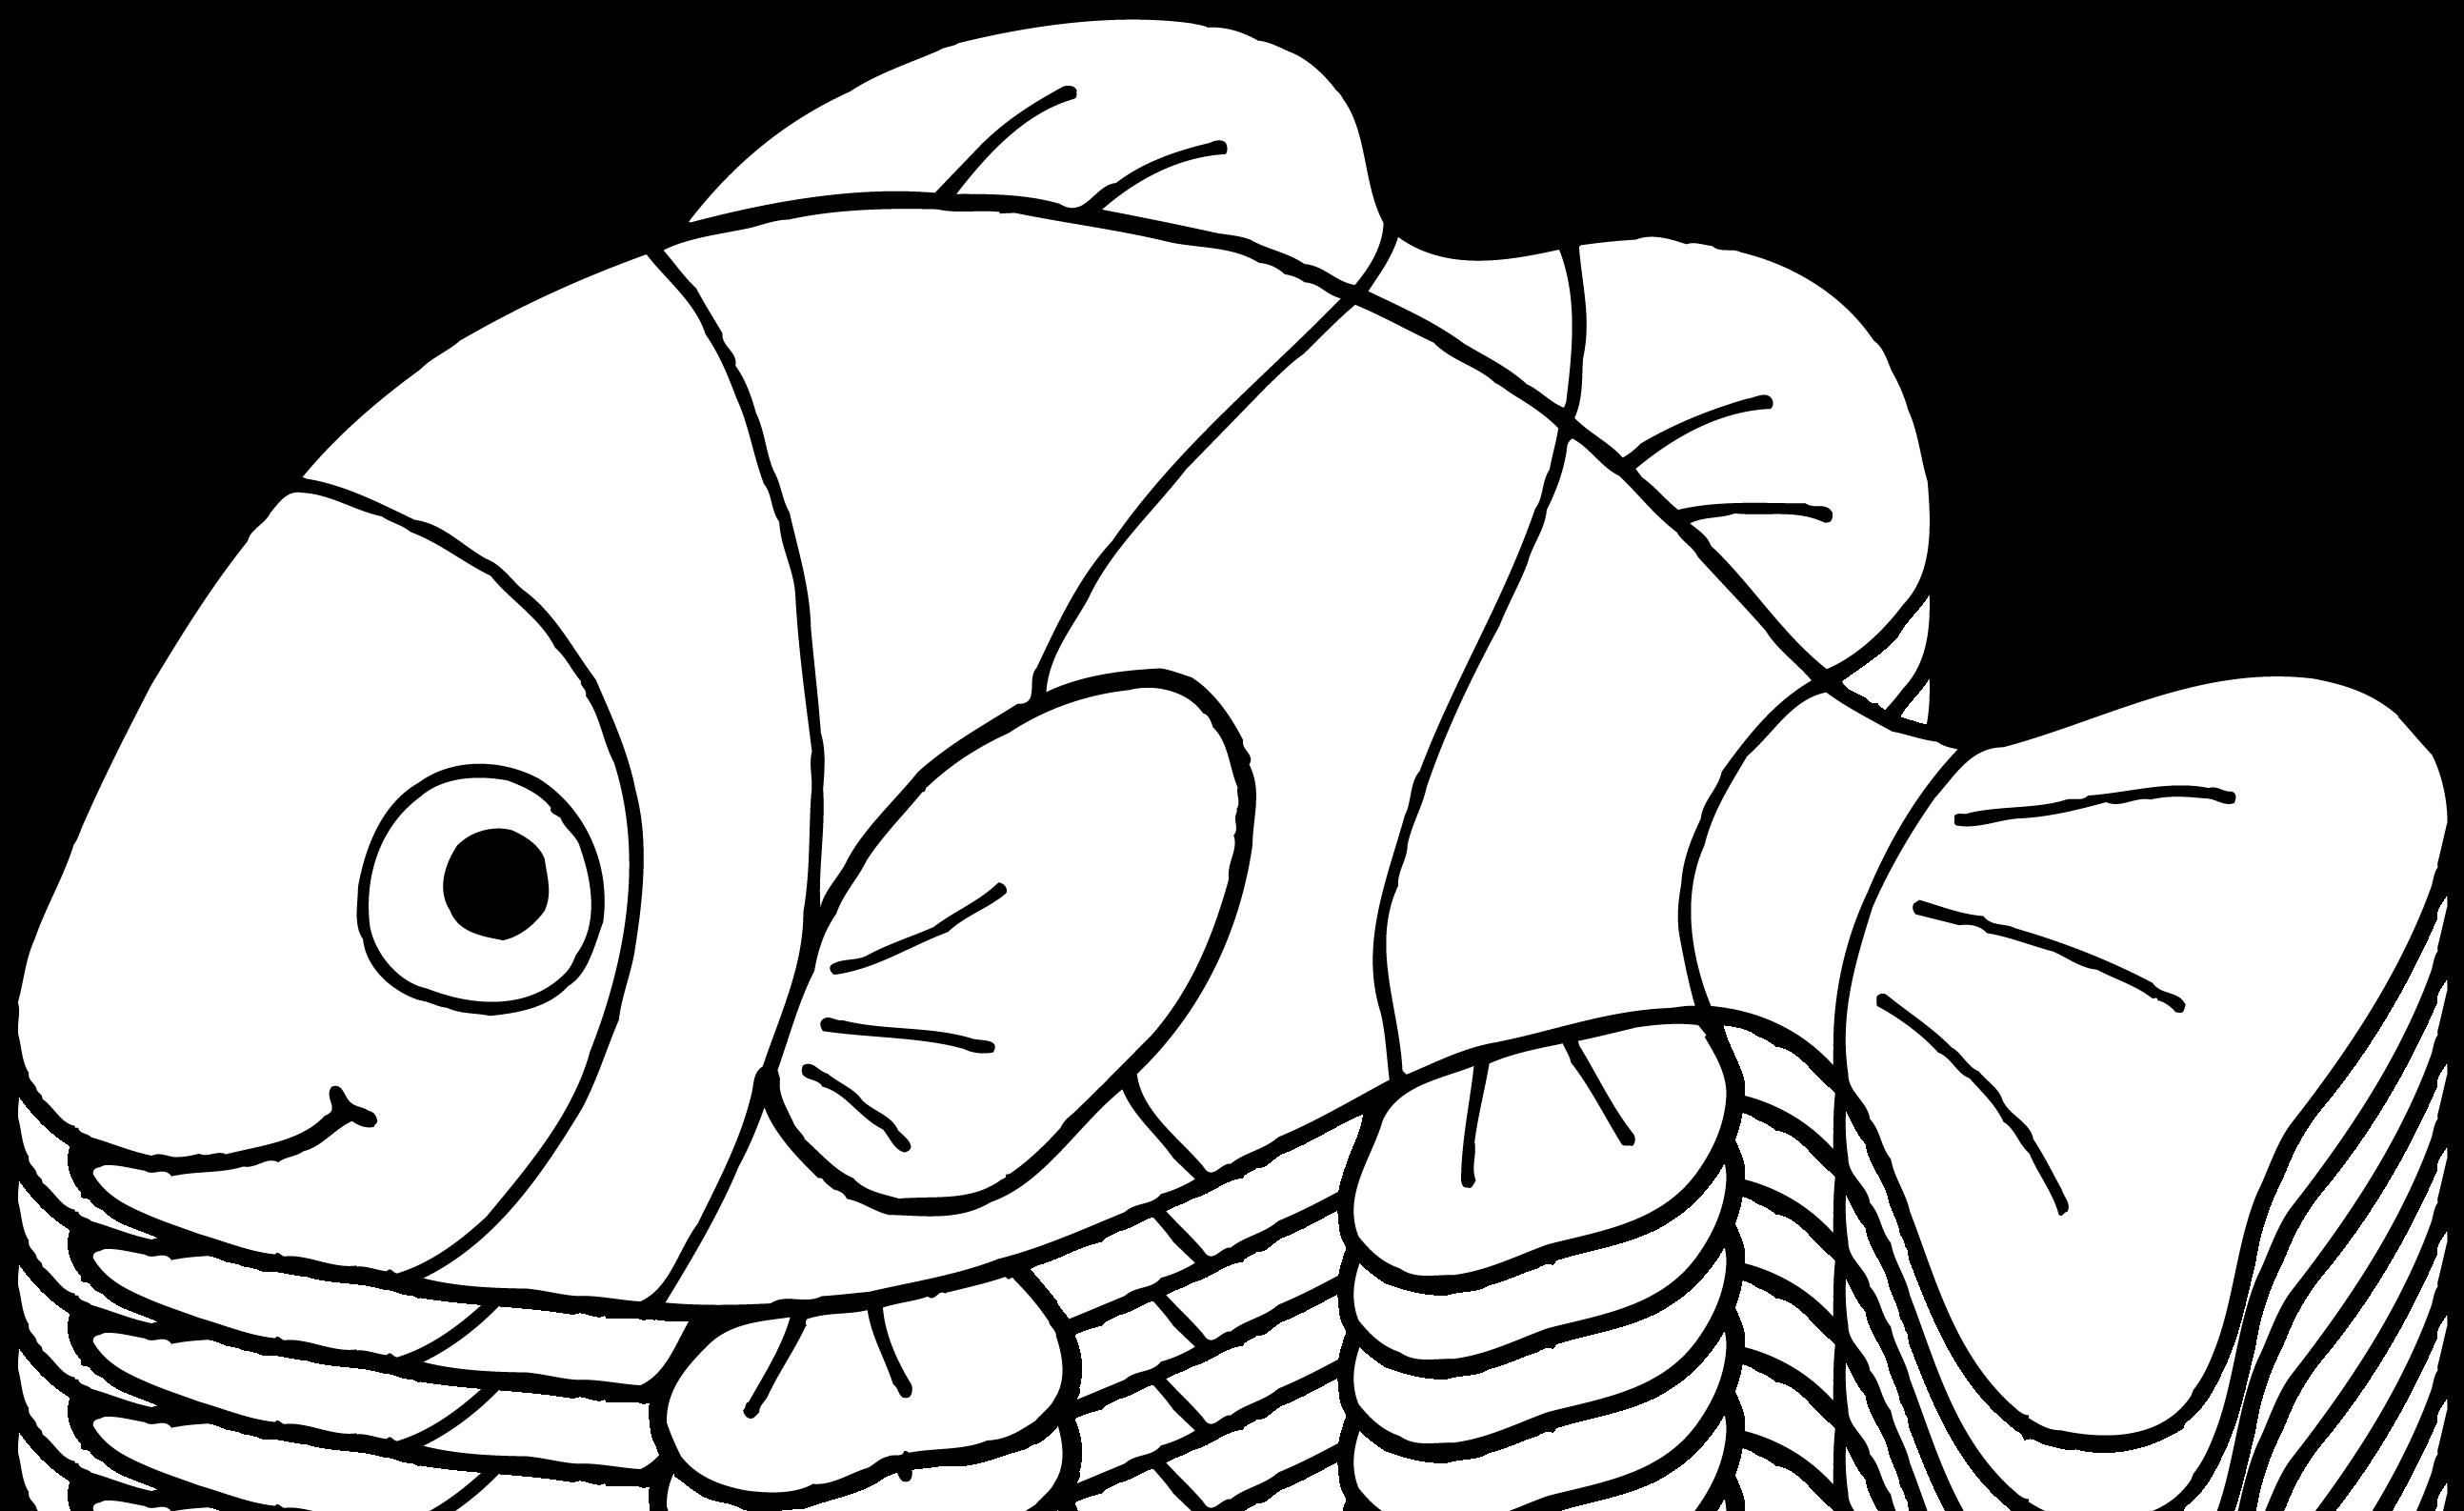 Minion clipart black and white. Often abbreviated b w